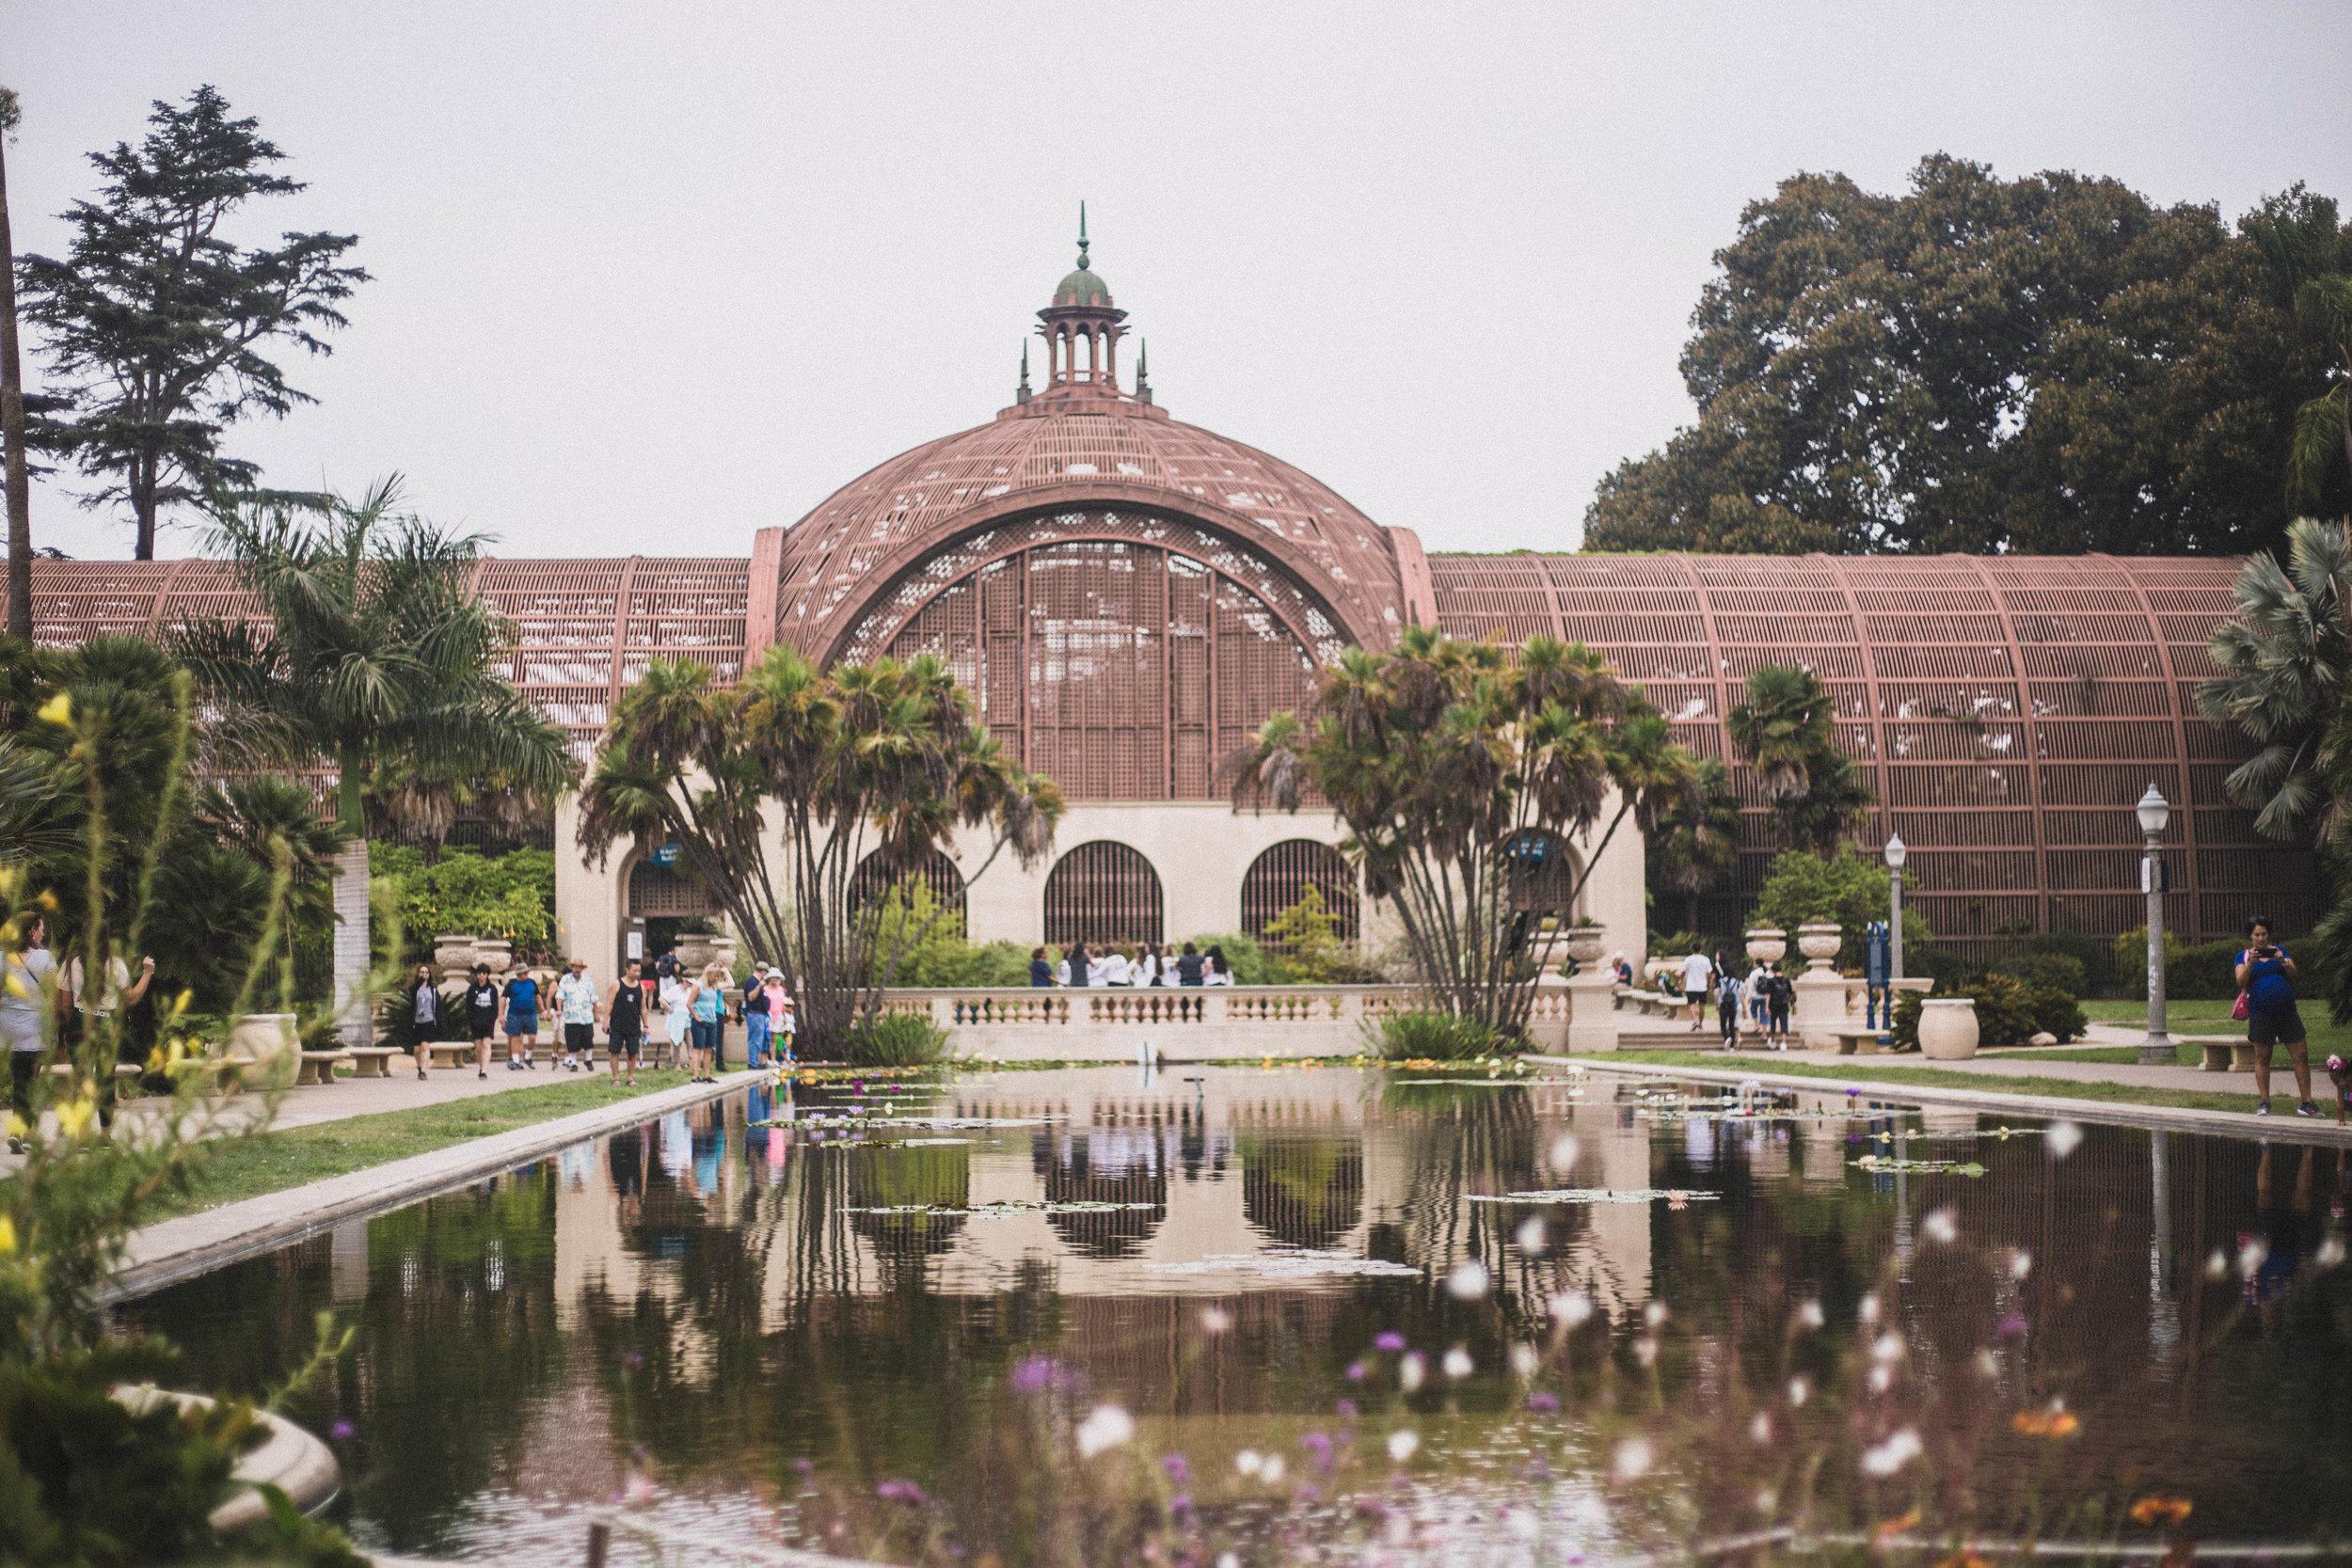 Botanic Garden in Balboa Park (San Diego City Guide)